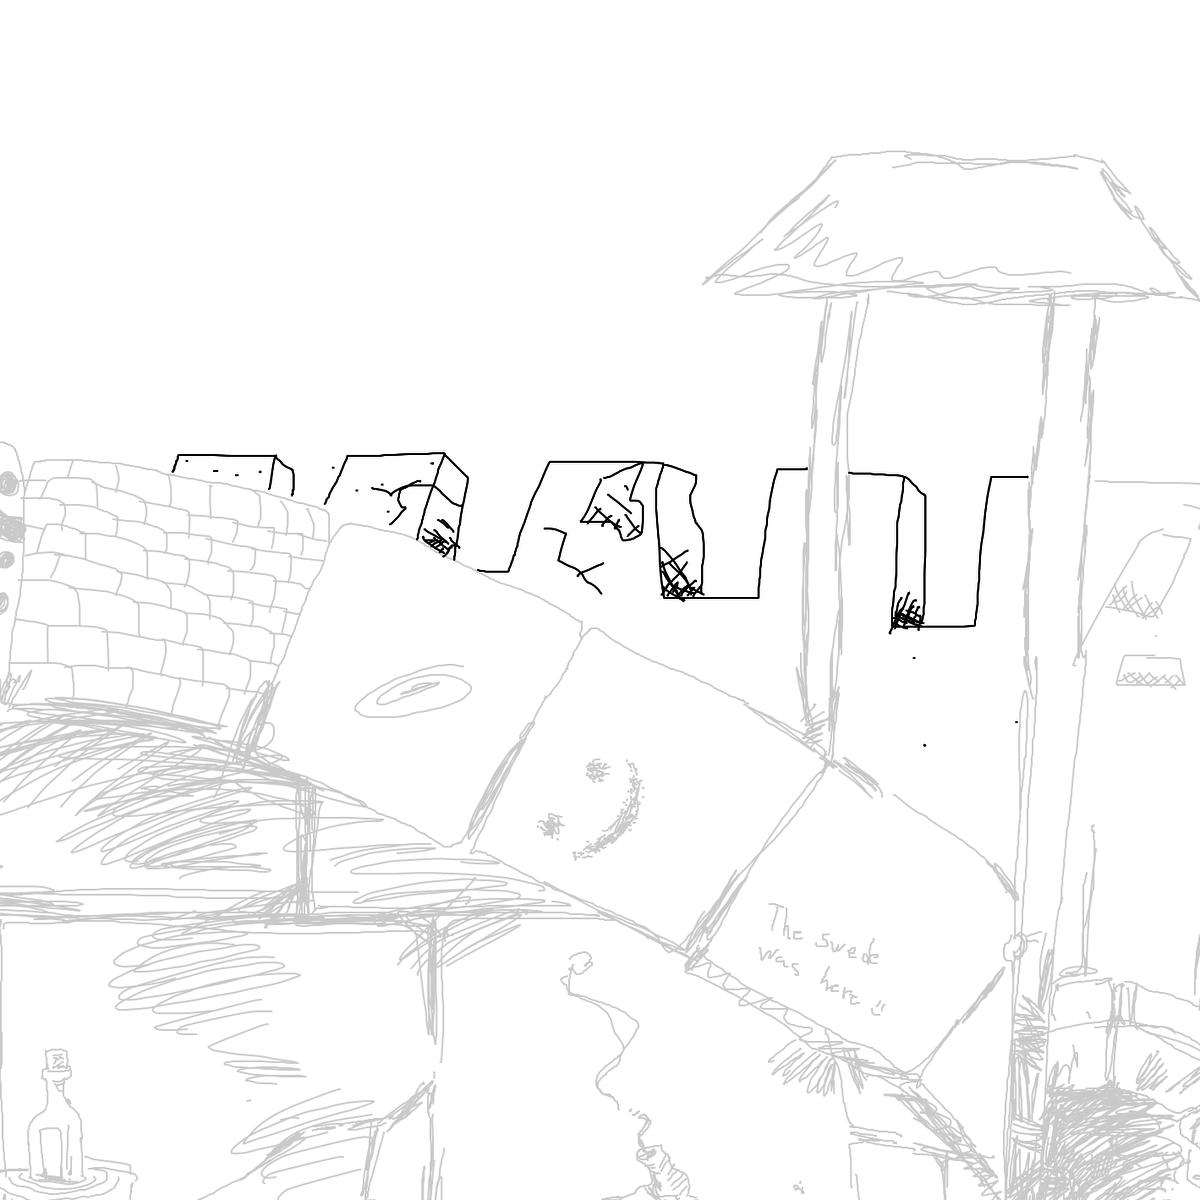 BAAAM drawing#24361 lat:78.4207458496093800lng: -4.4901089668273930